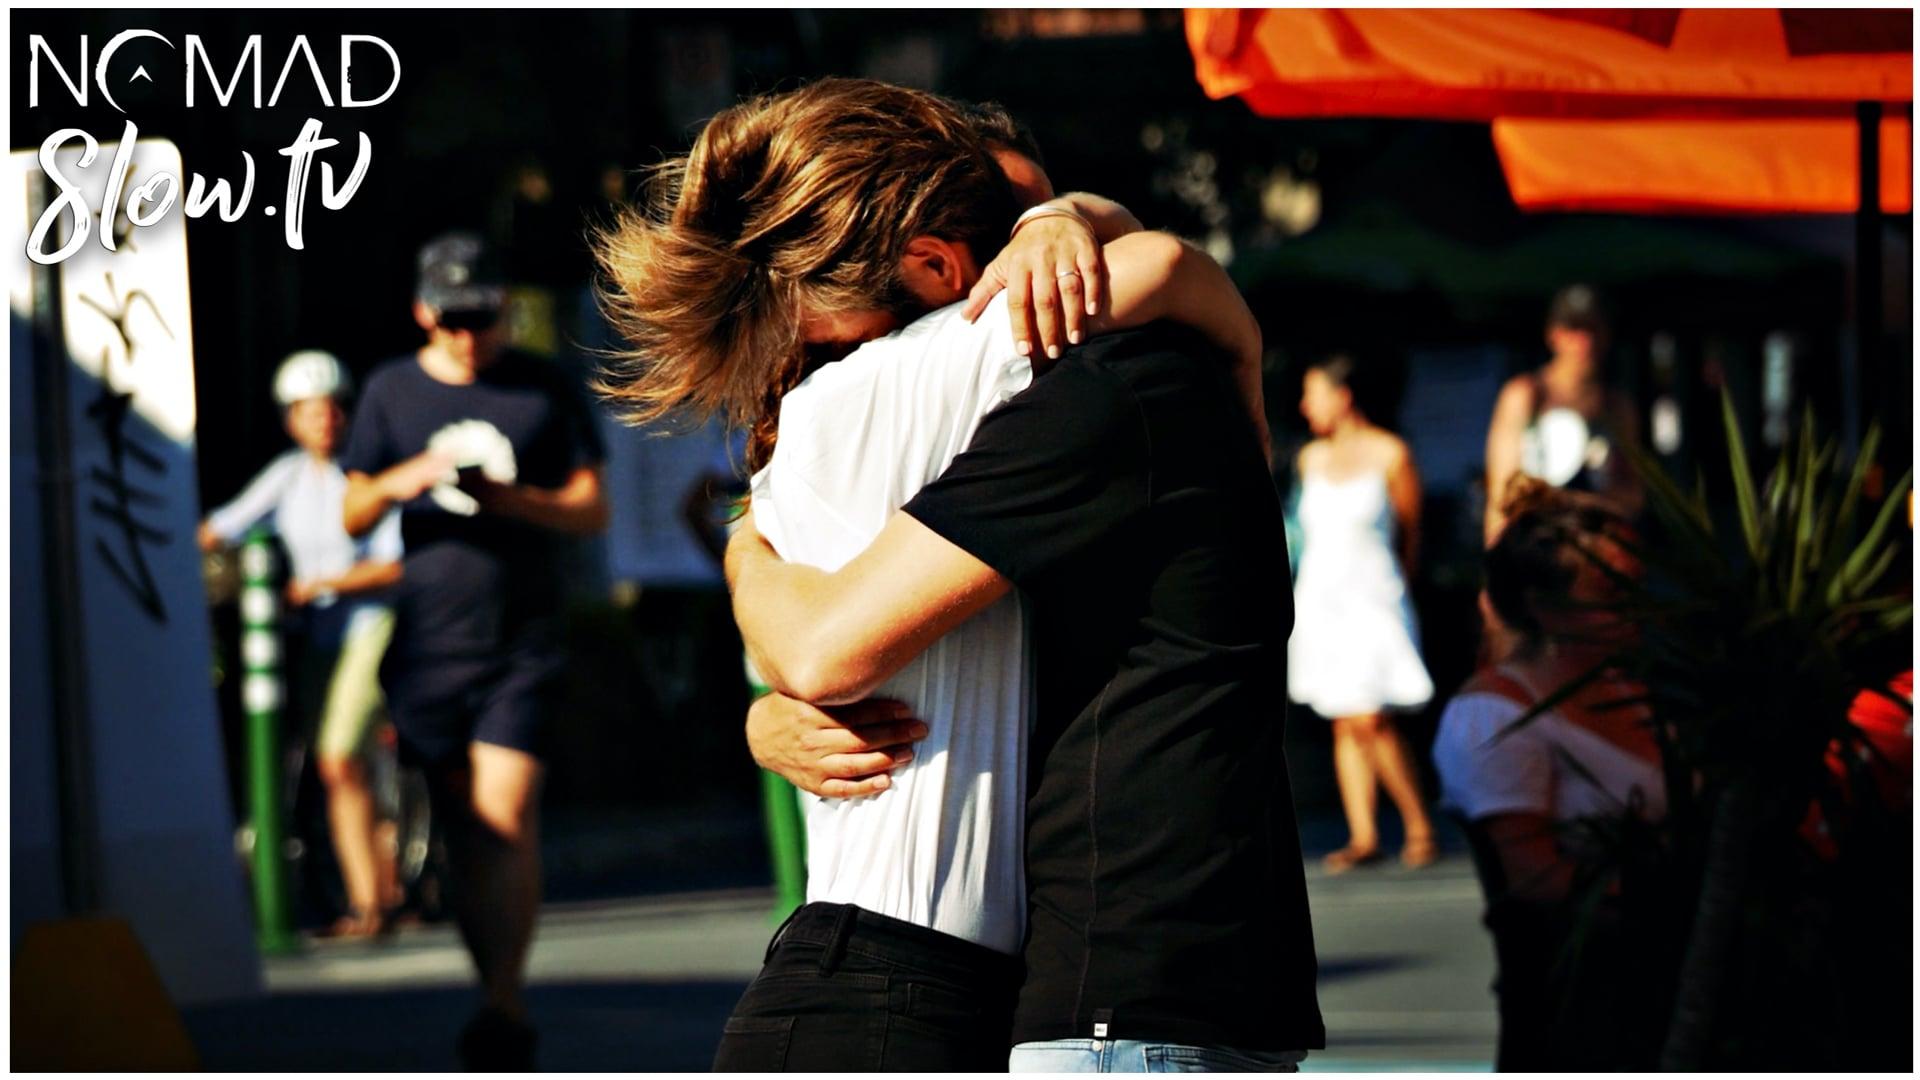 One Hour Hug on NOMADslow.tv